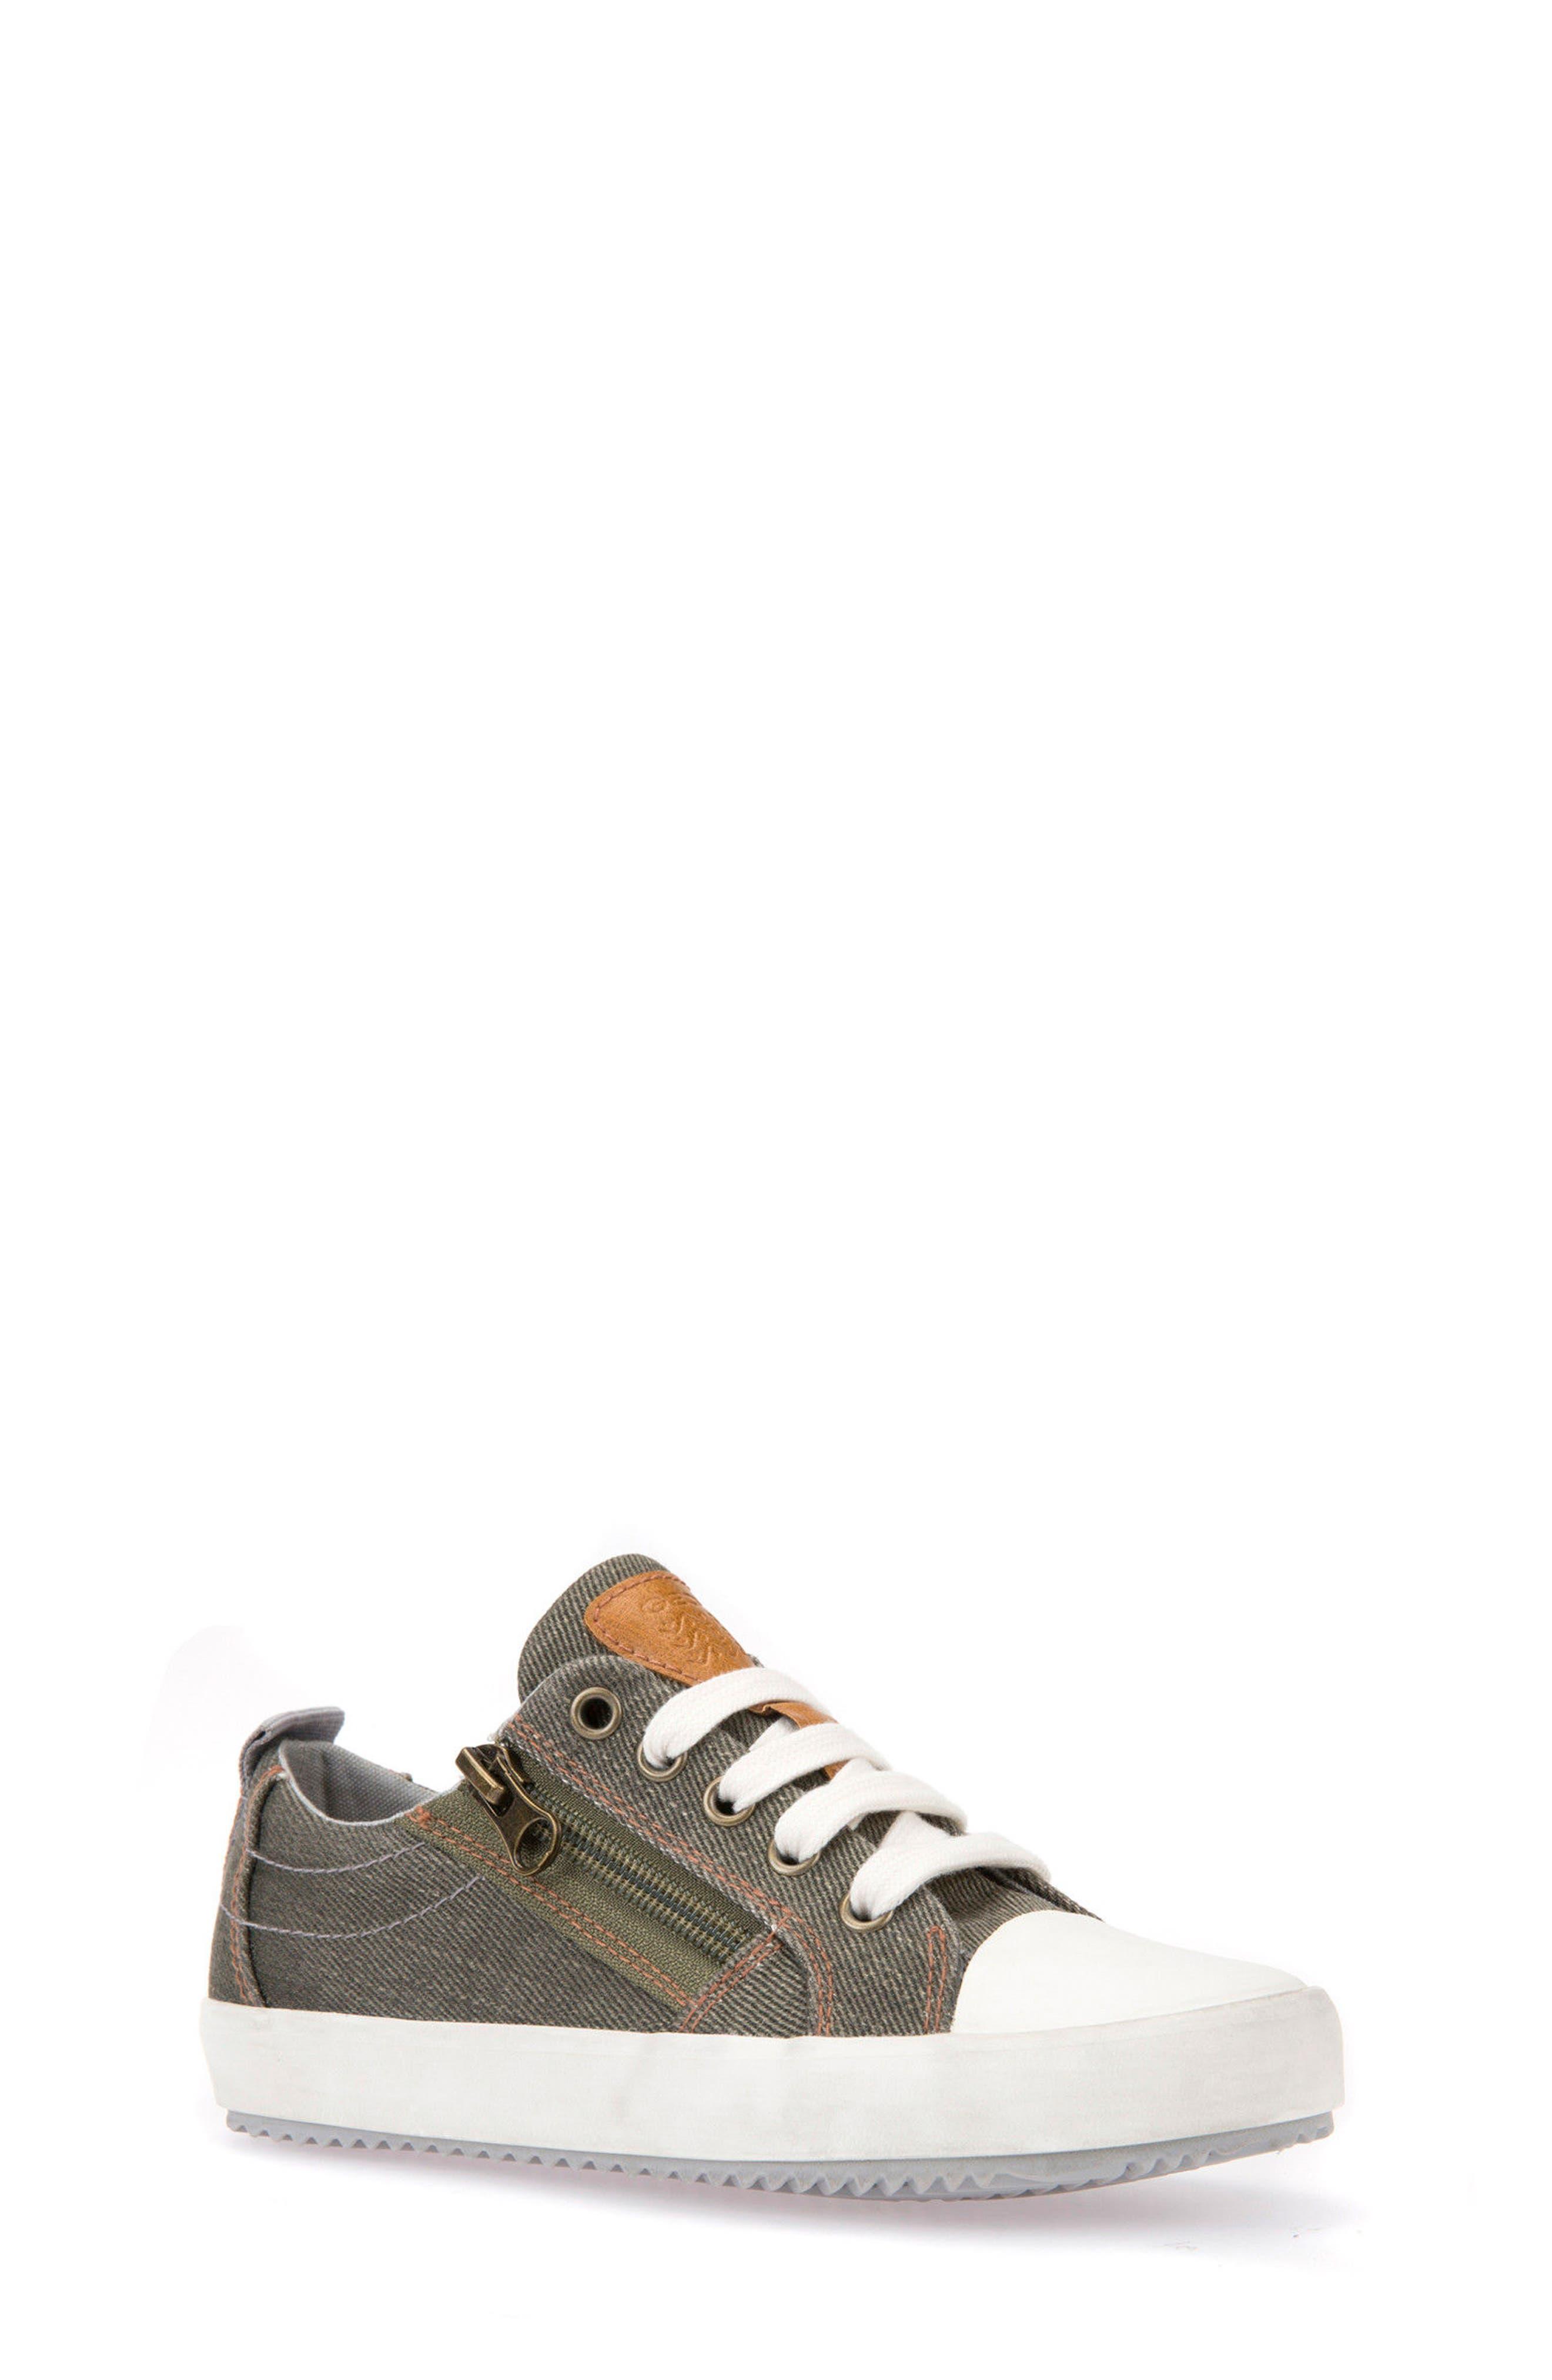 Main Image - Geox Alonisso Low Top Sneaker (Toddler, Little Kid & Big Kid)